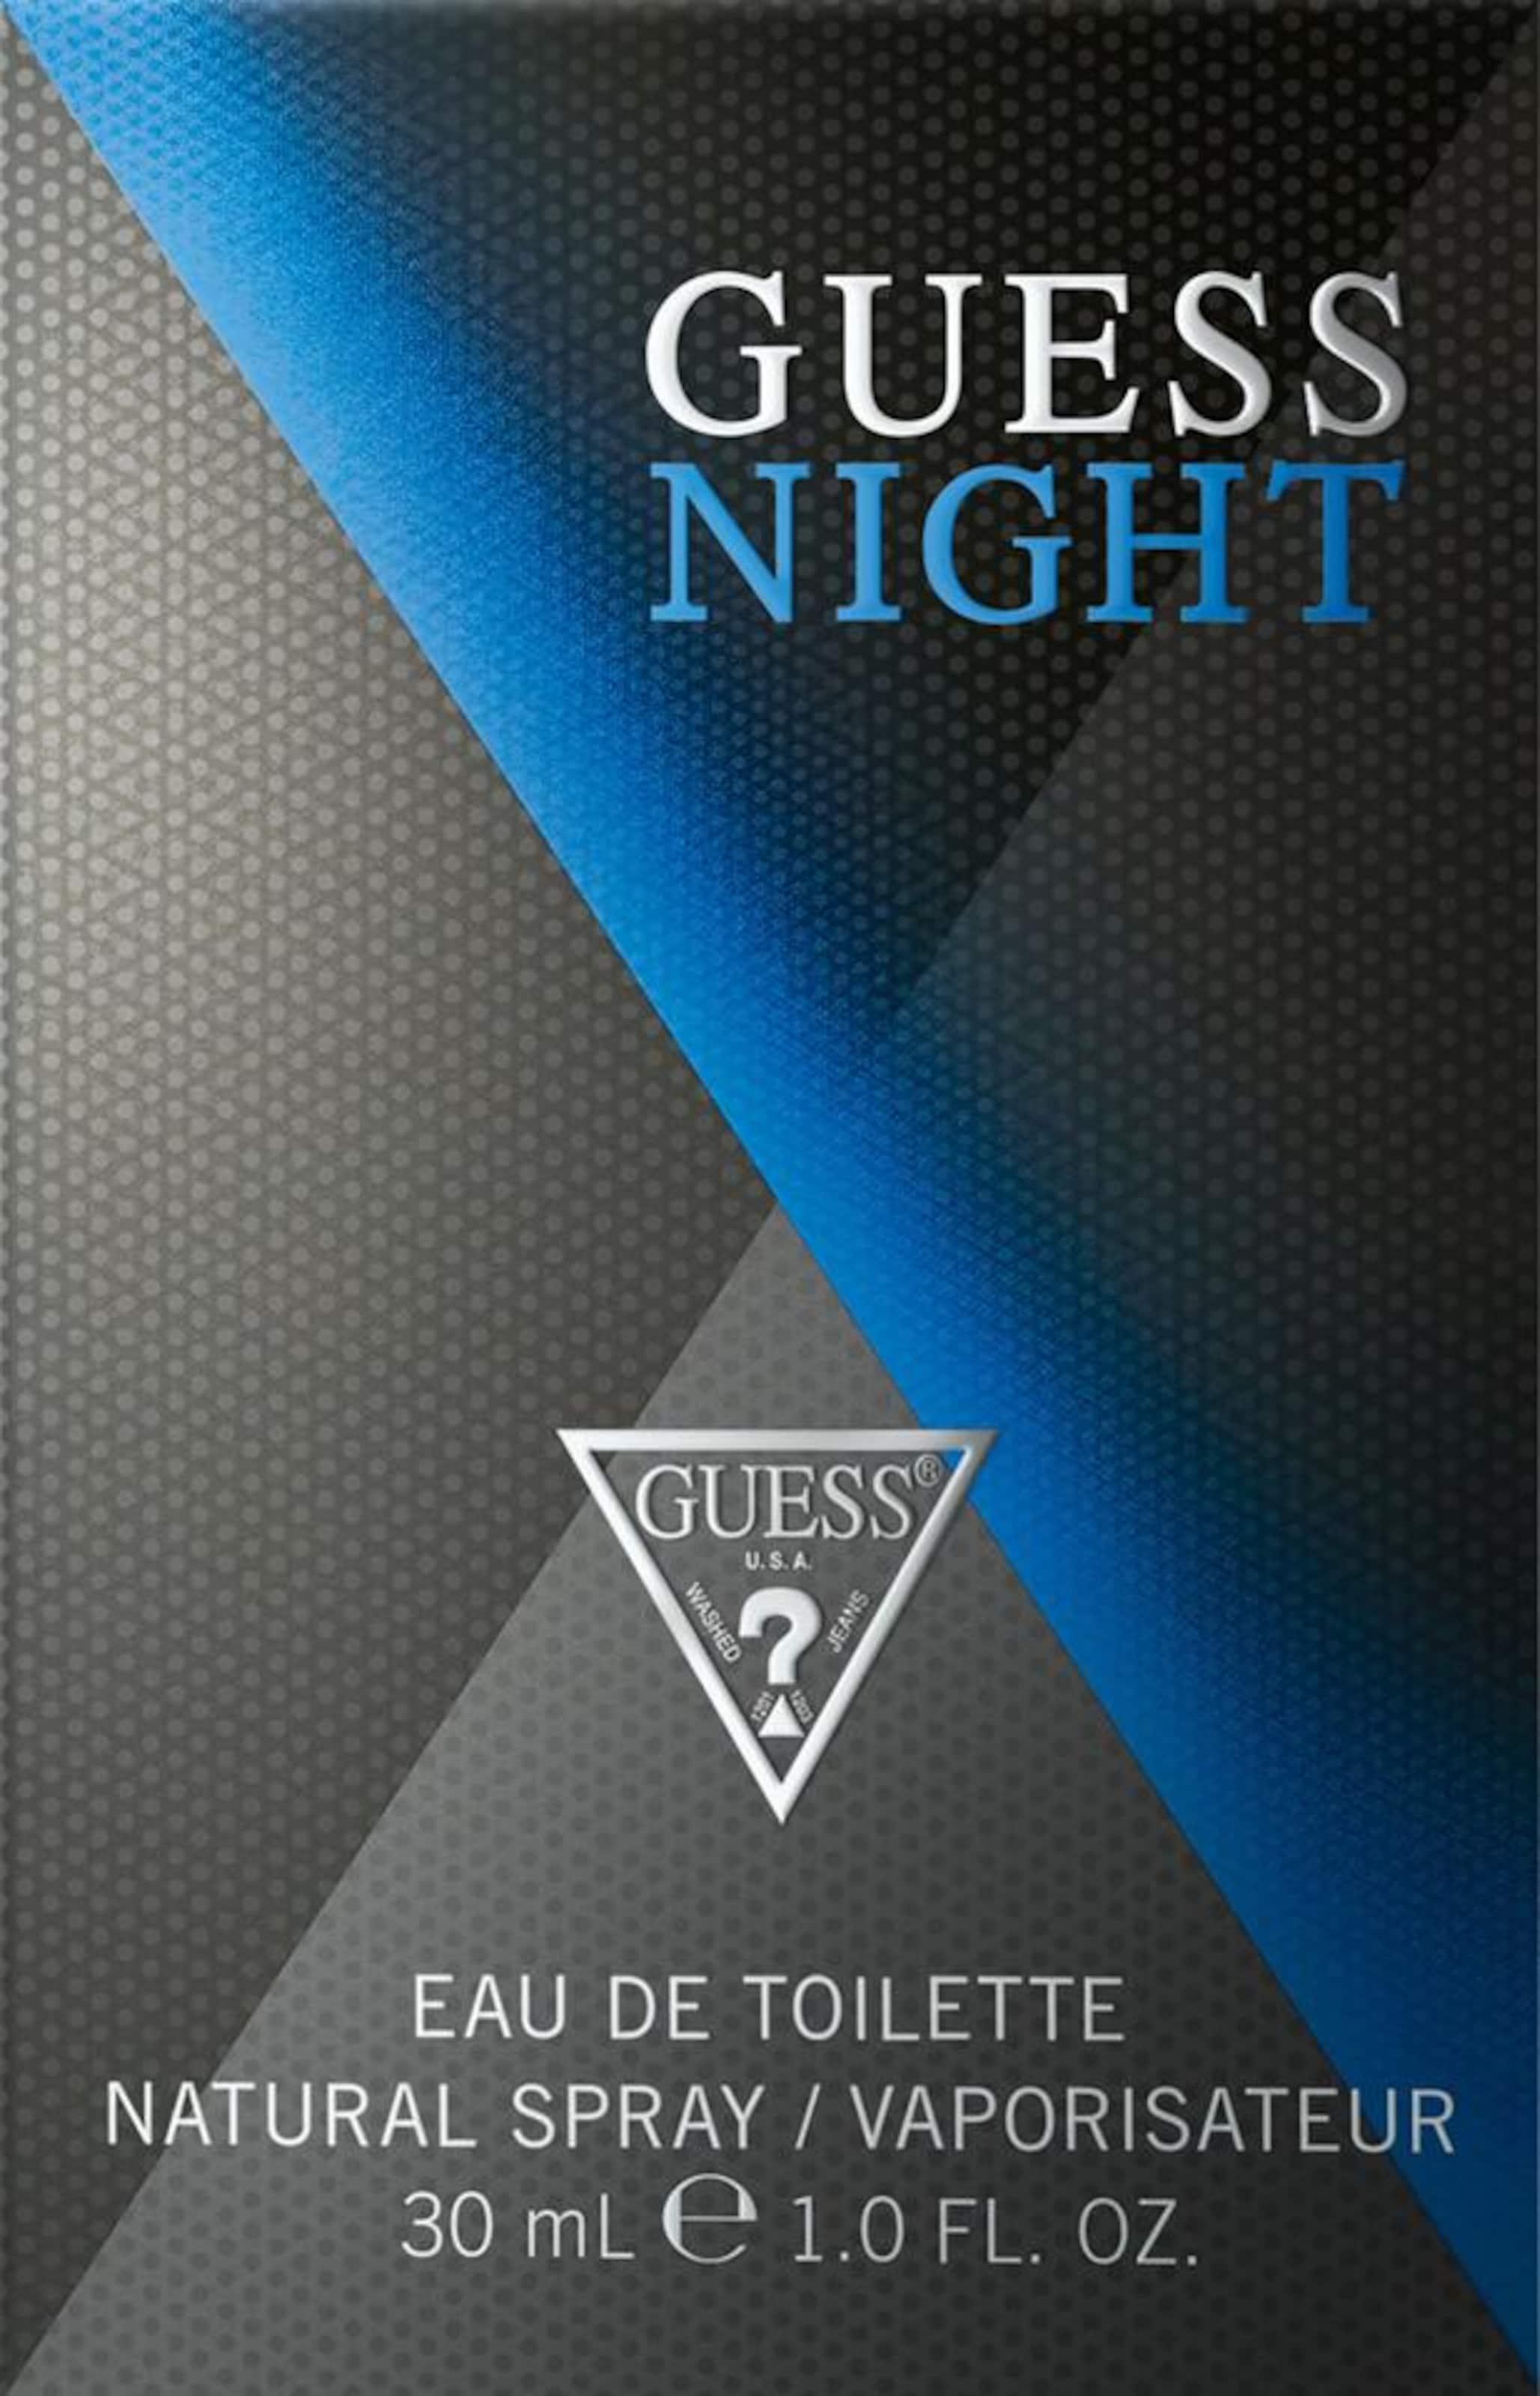 Auftrag Billig Ausverkauf GUESS 'Night' Eau de Toilette Original OfIEelB